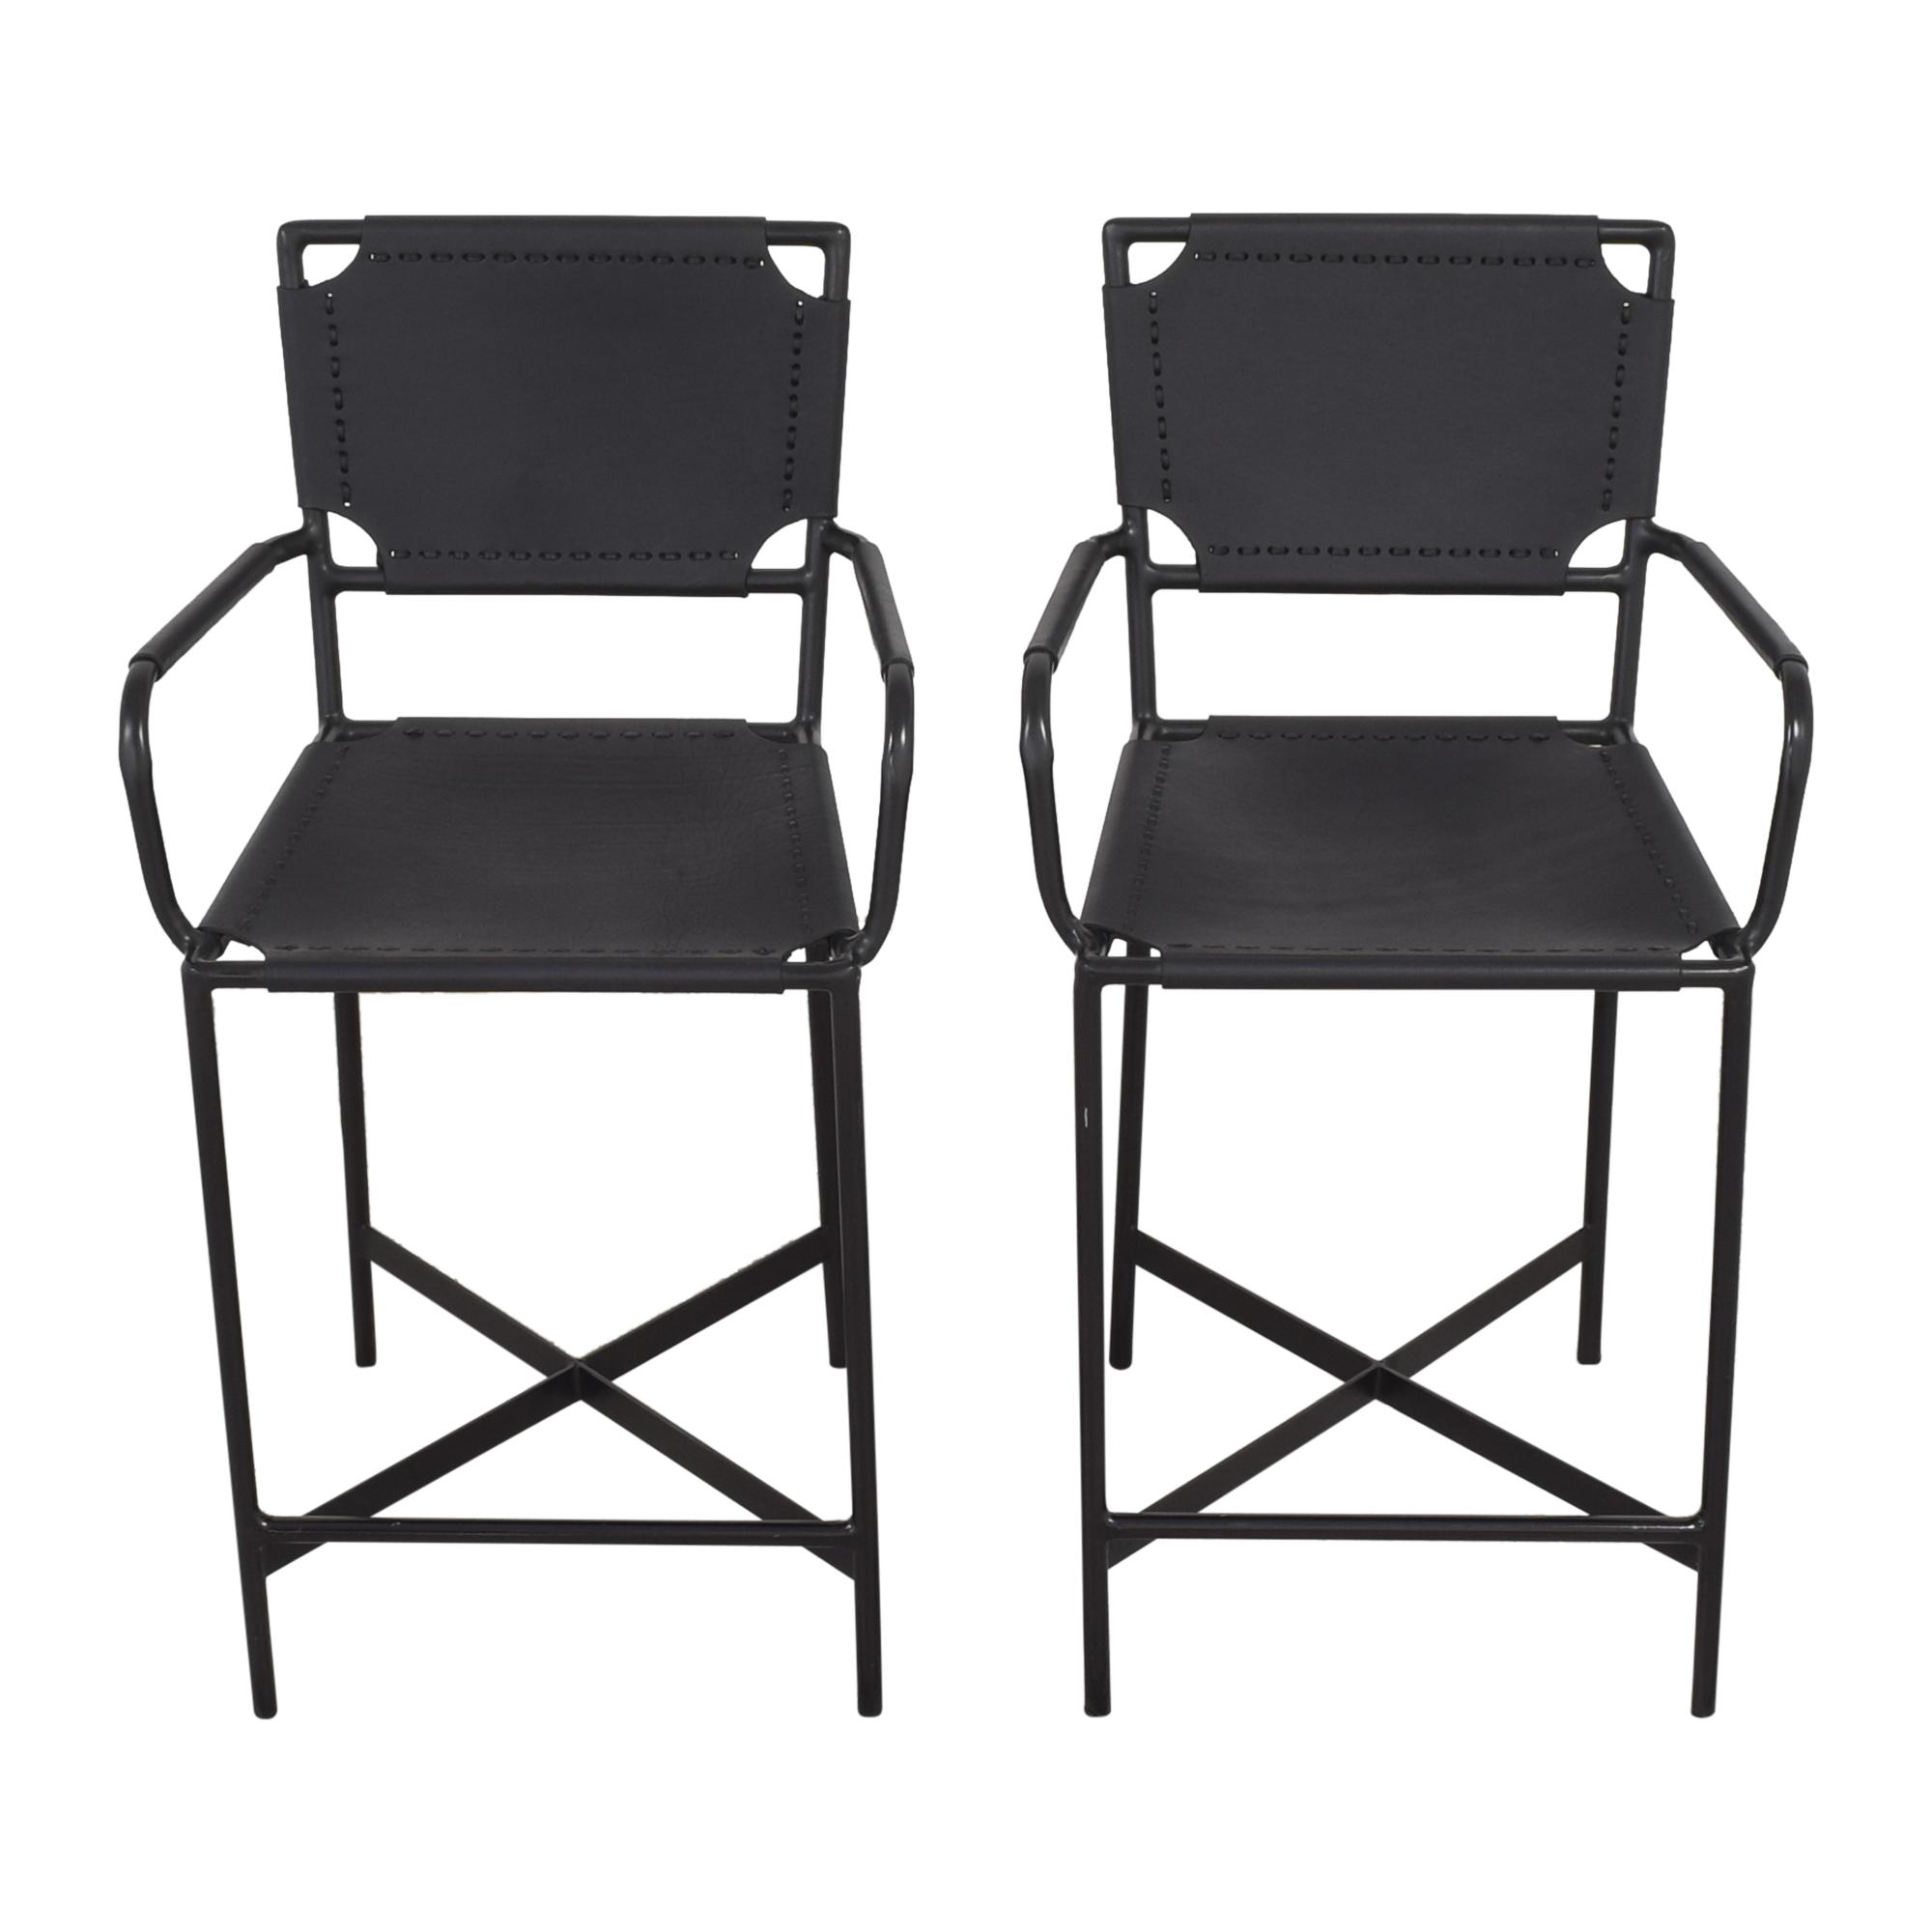 buy Crate & Barrel Laredo Counter Stools Crate & Barrel Chairs